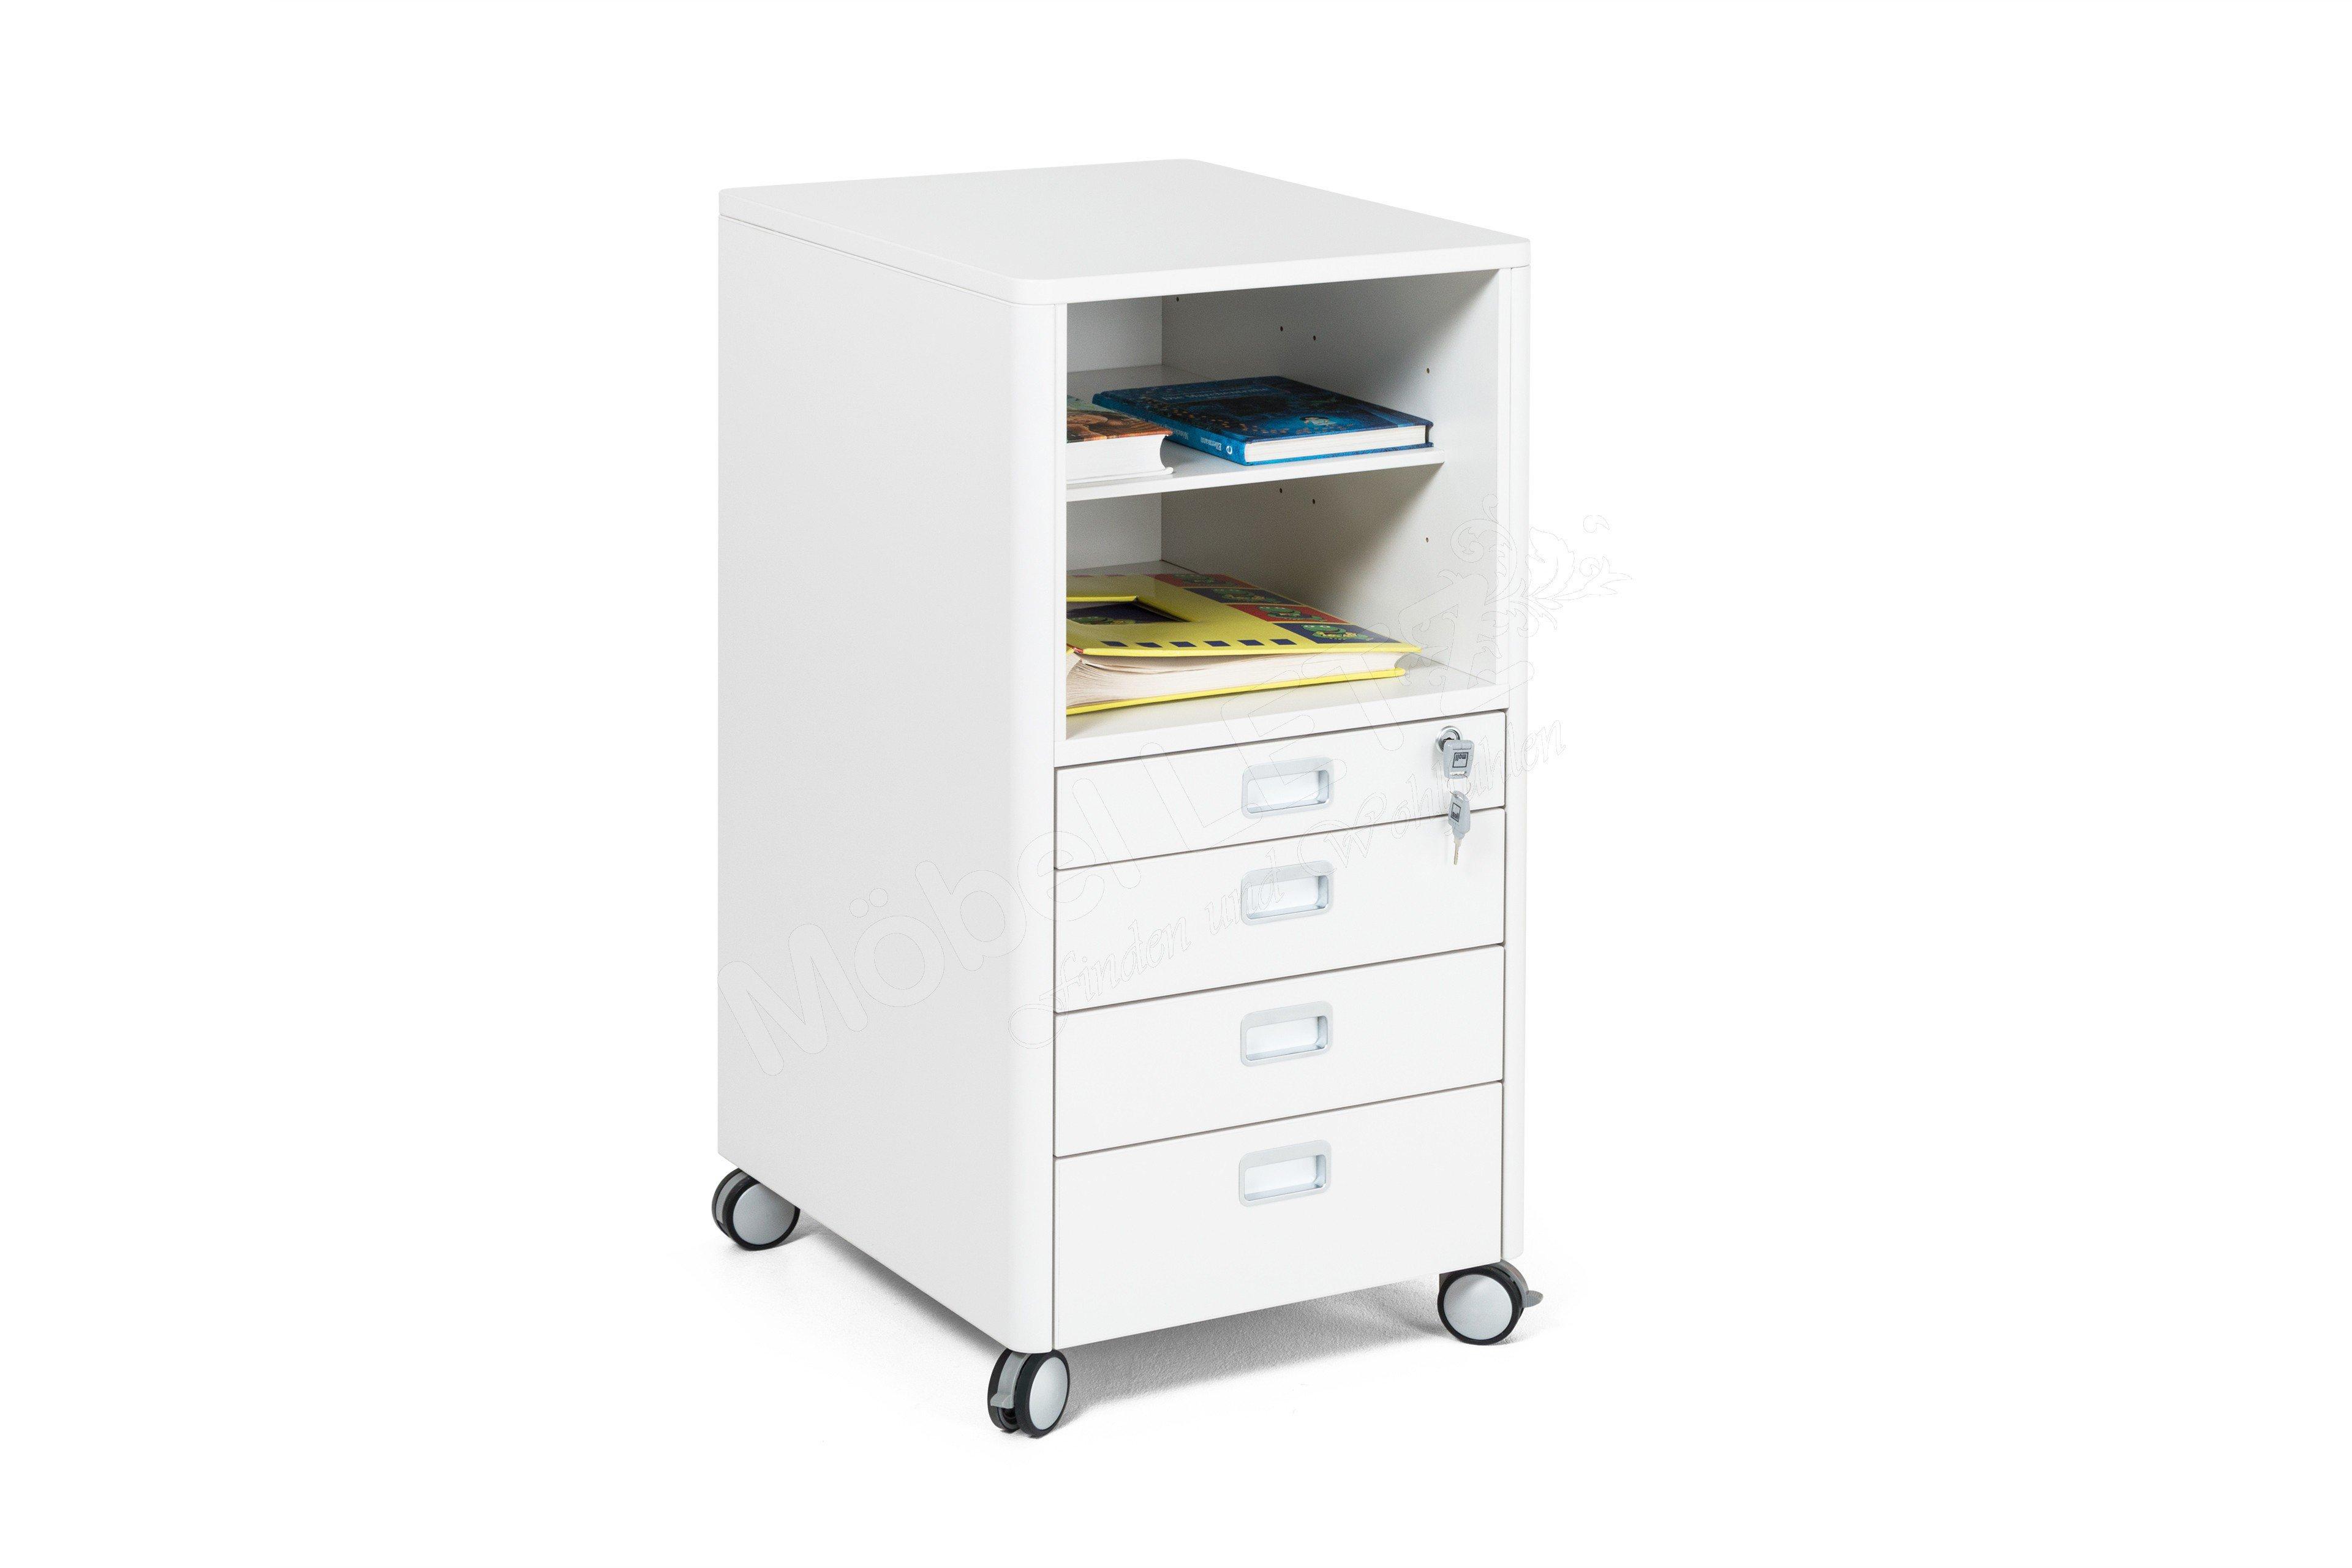 rollcontainer moll champion cubicmax wei m bel letz ihr online shop. Black Bedroom Furniture Sets. Home Design Ideas